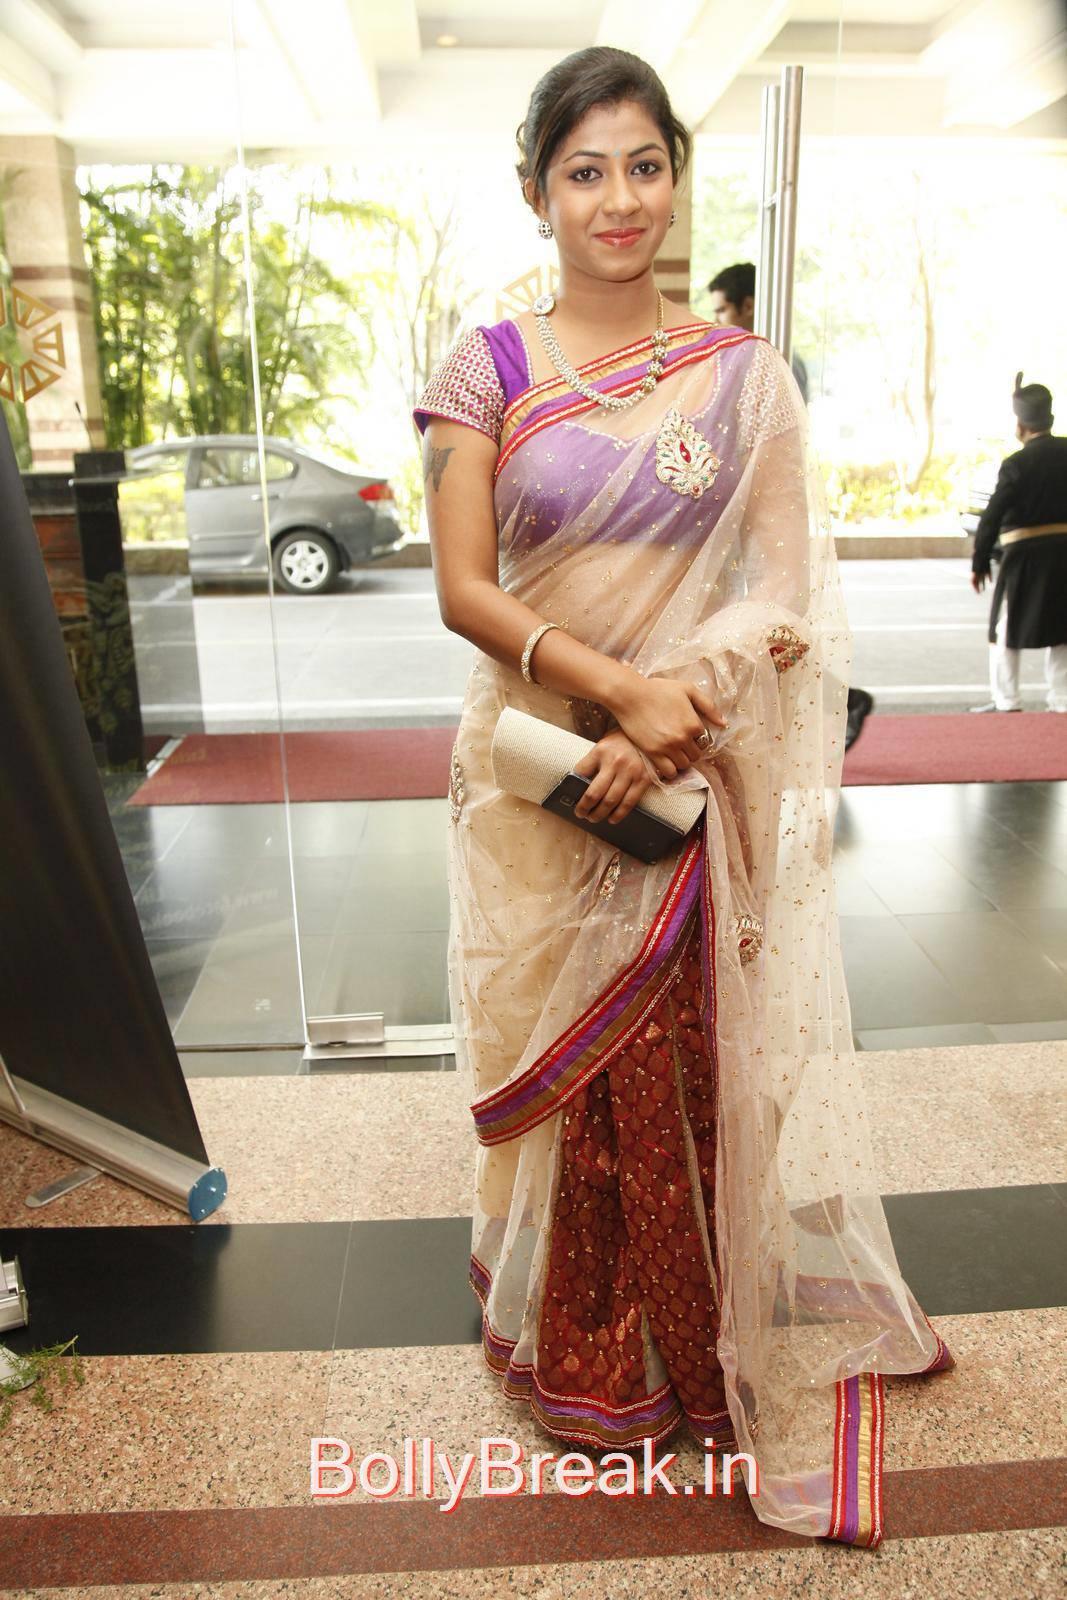 Geethanjali Pics At Akritti Elite Exhibition Opening, Geethanjali Hot Pics from Akritti Elite Exhibition Launch